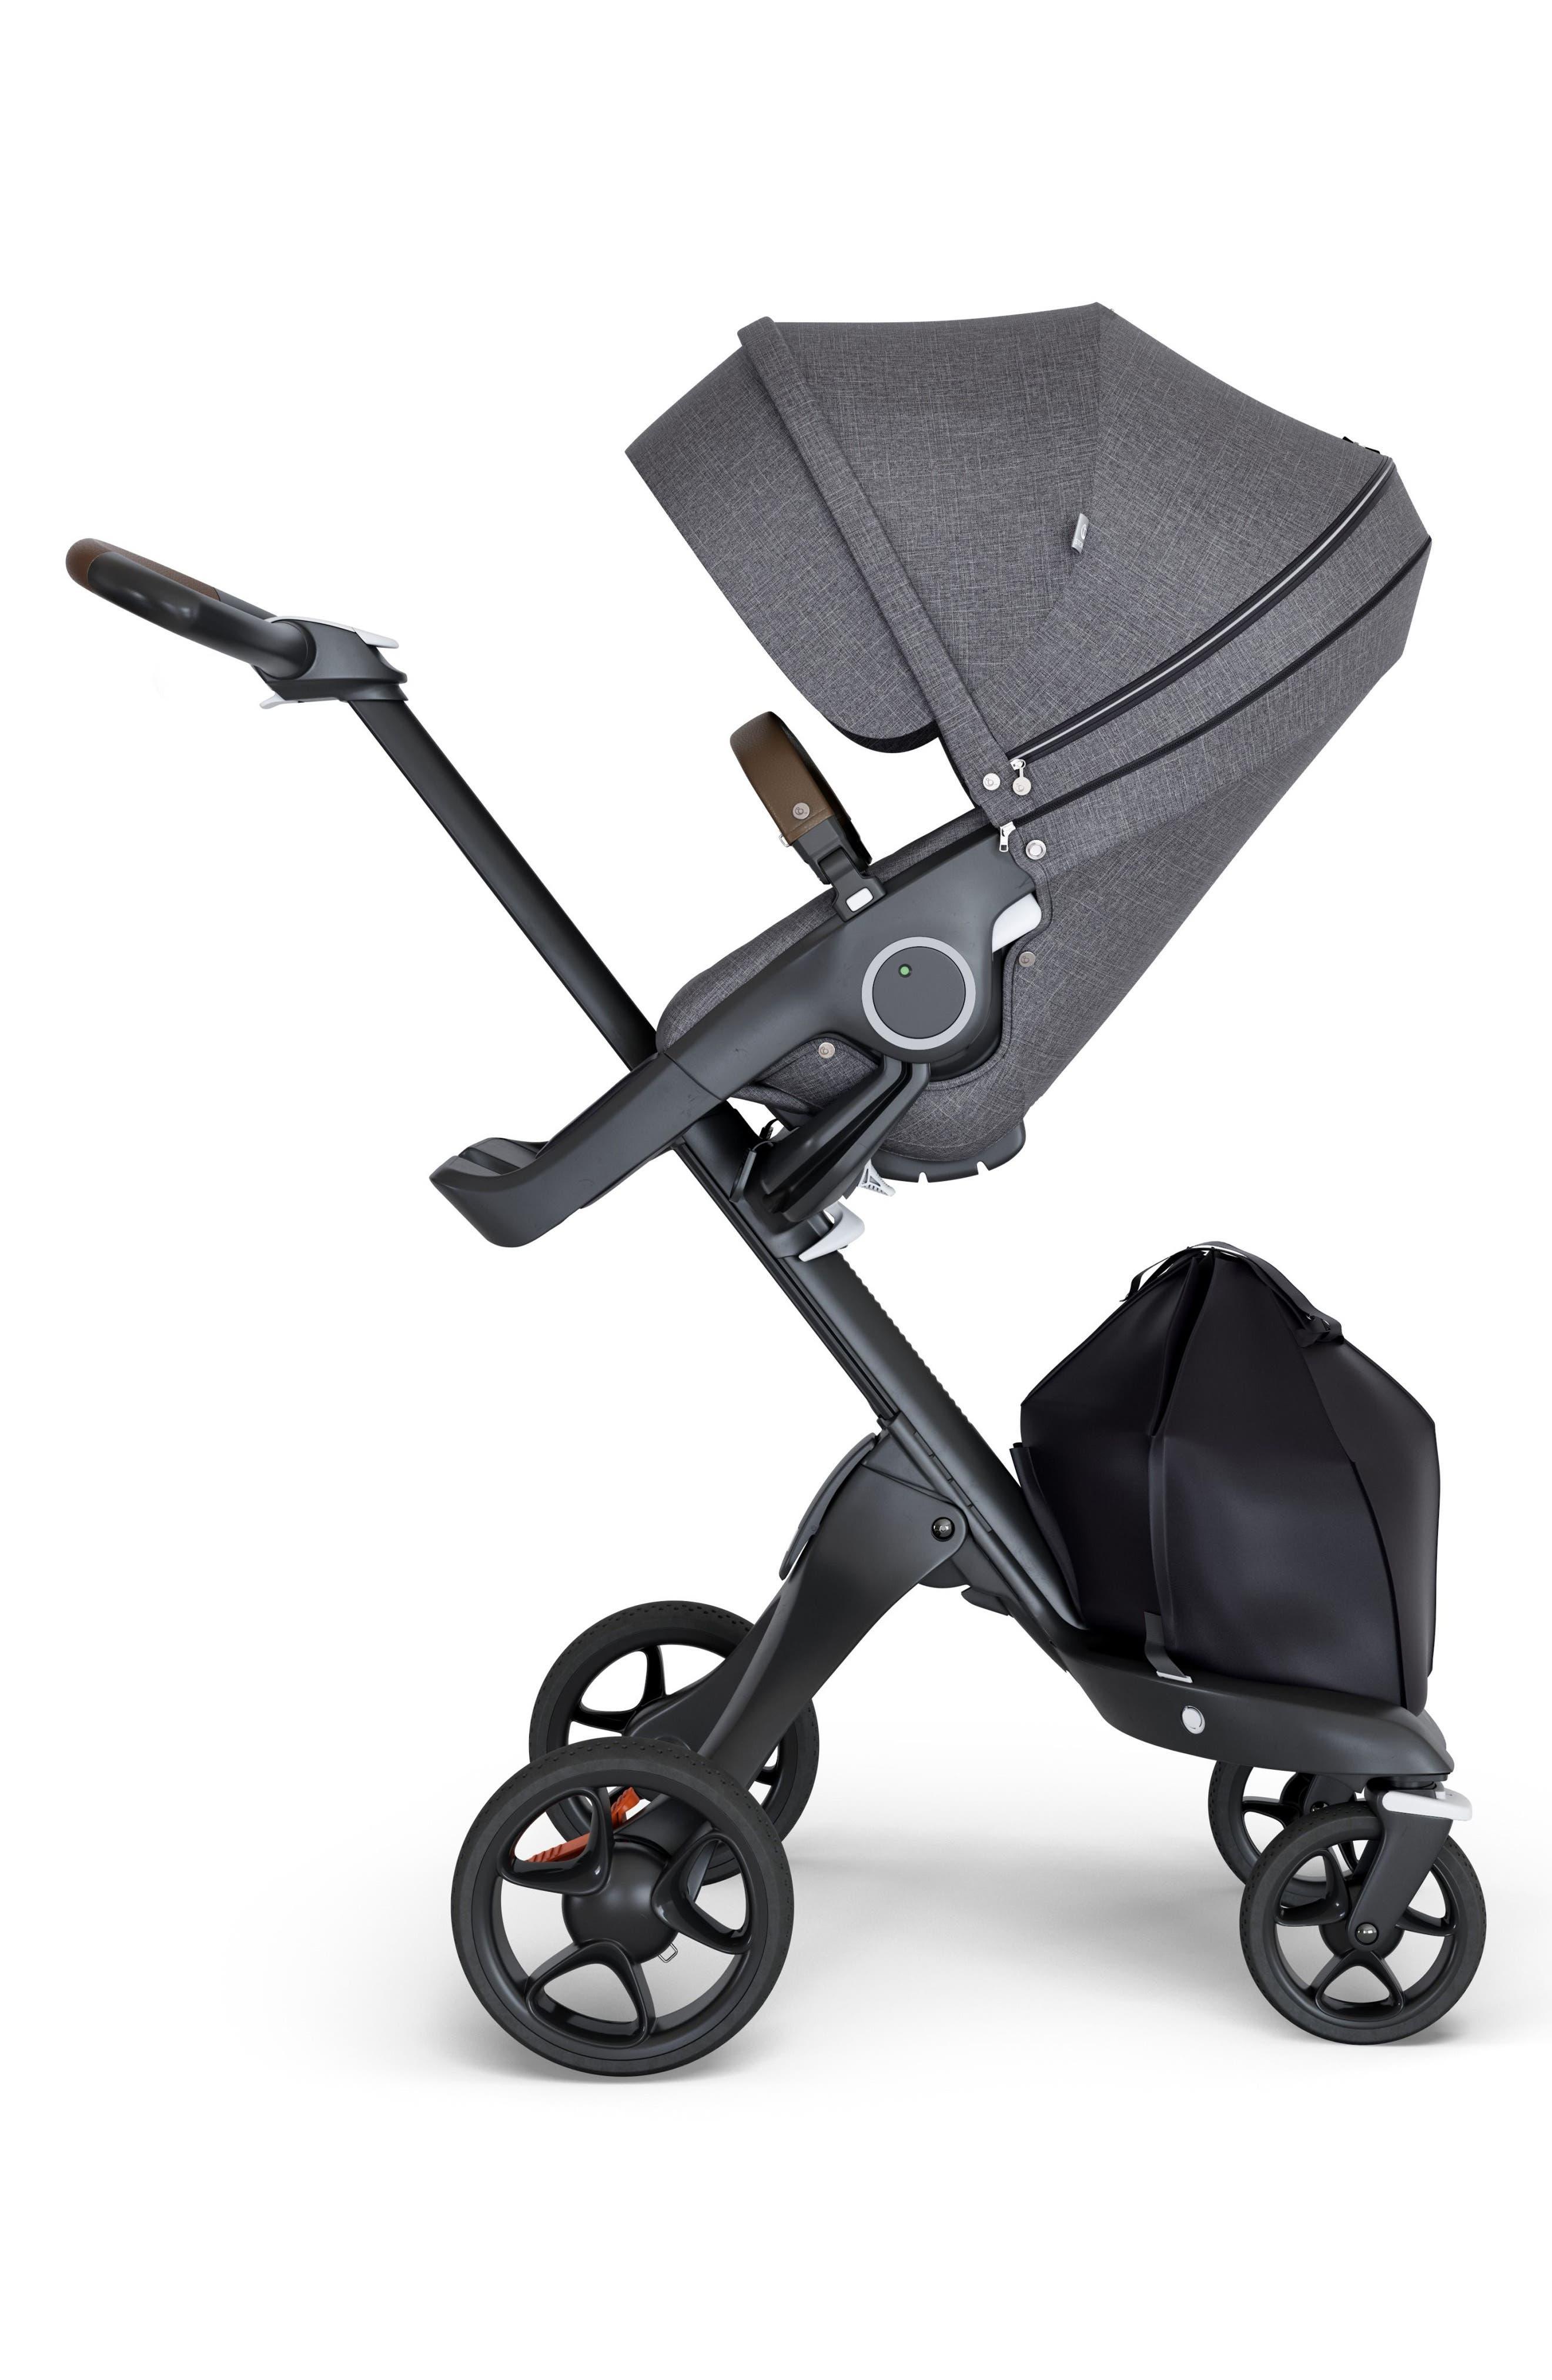 STOKKE, Xplory<sup>®</sup> Black Chassis Stroller, Main thumbnail 1, color, BLACK MELANGE